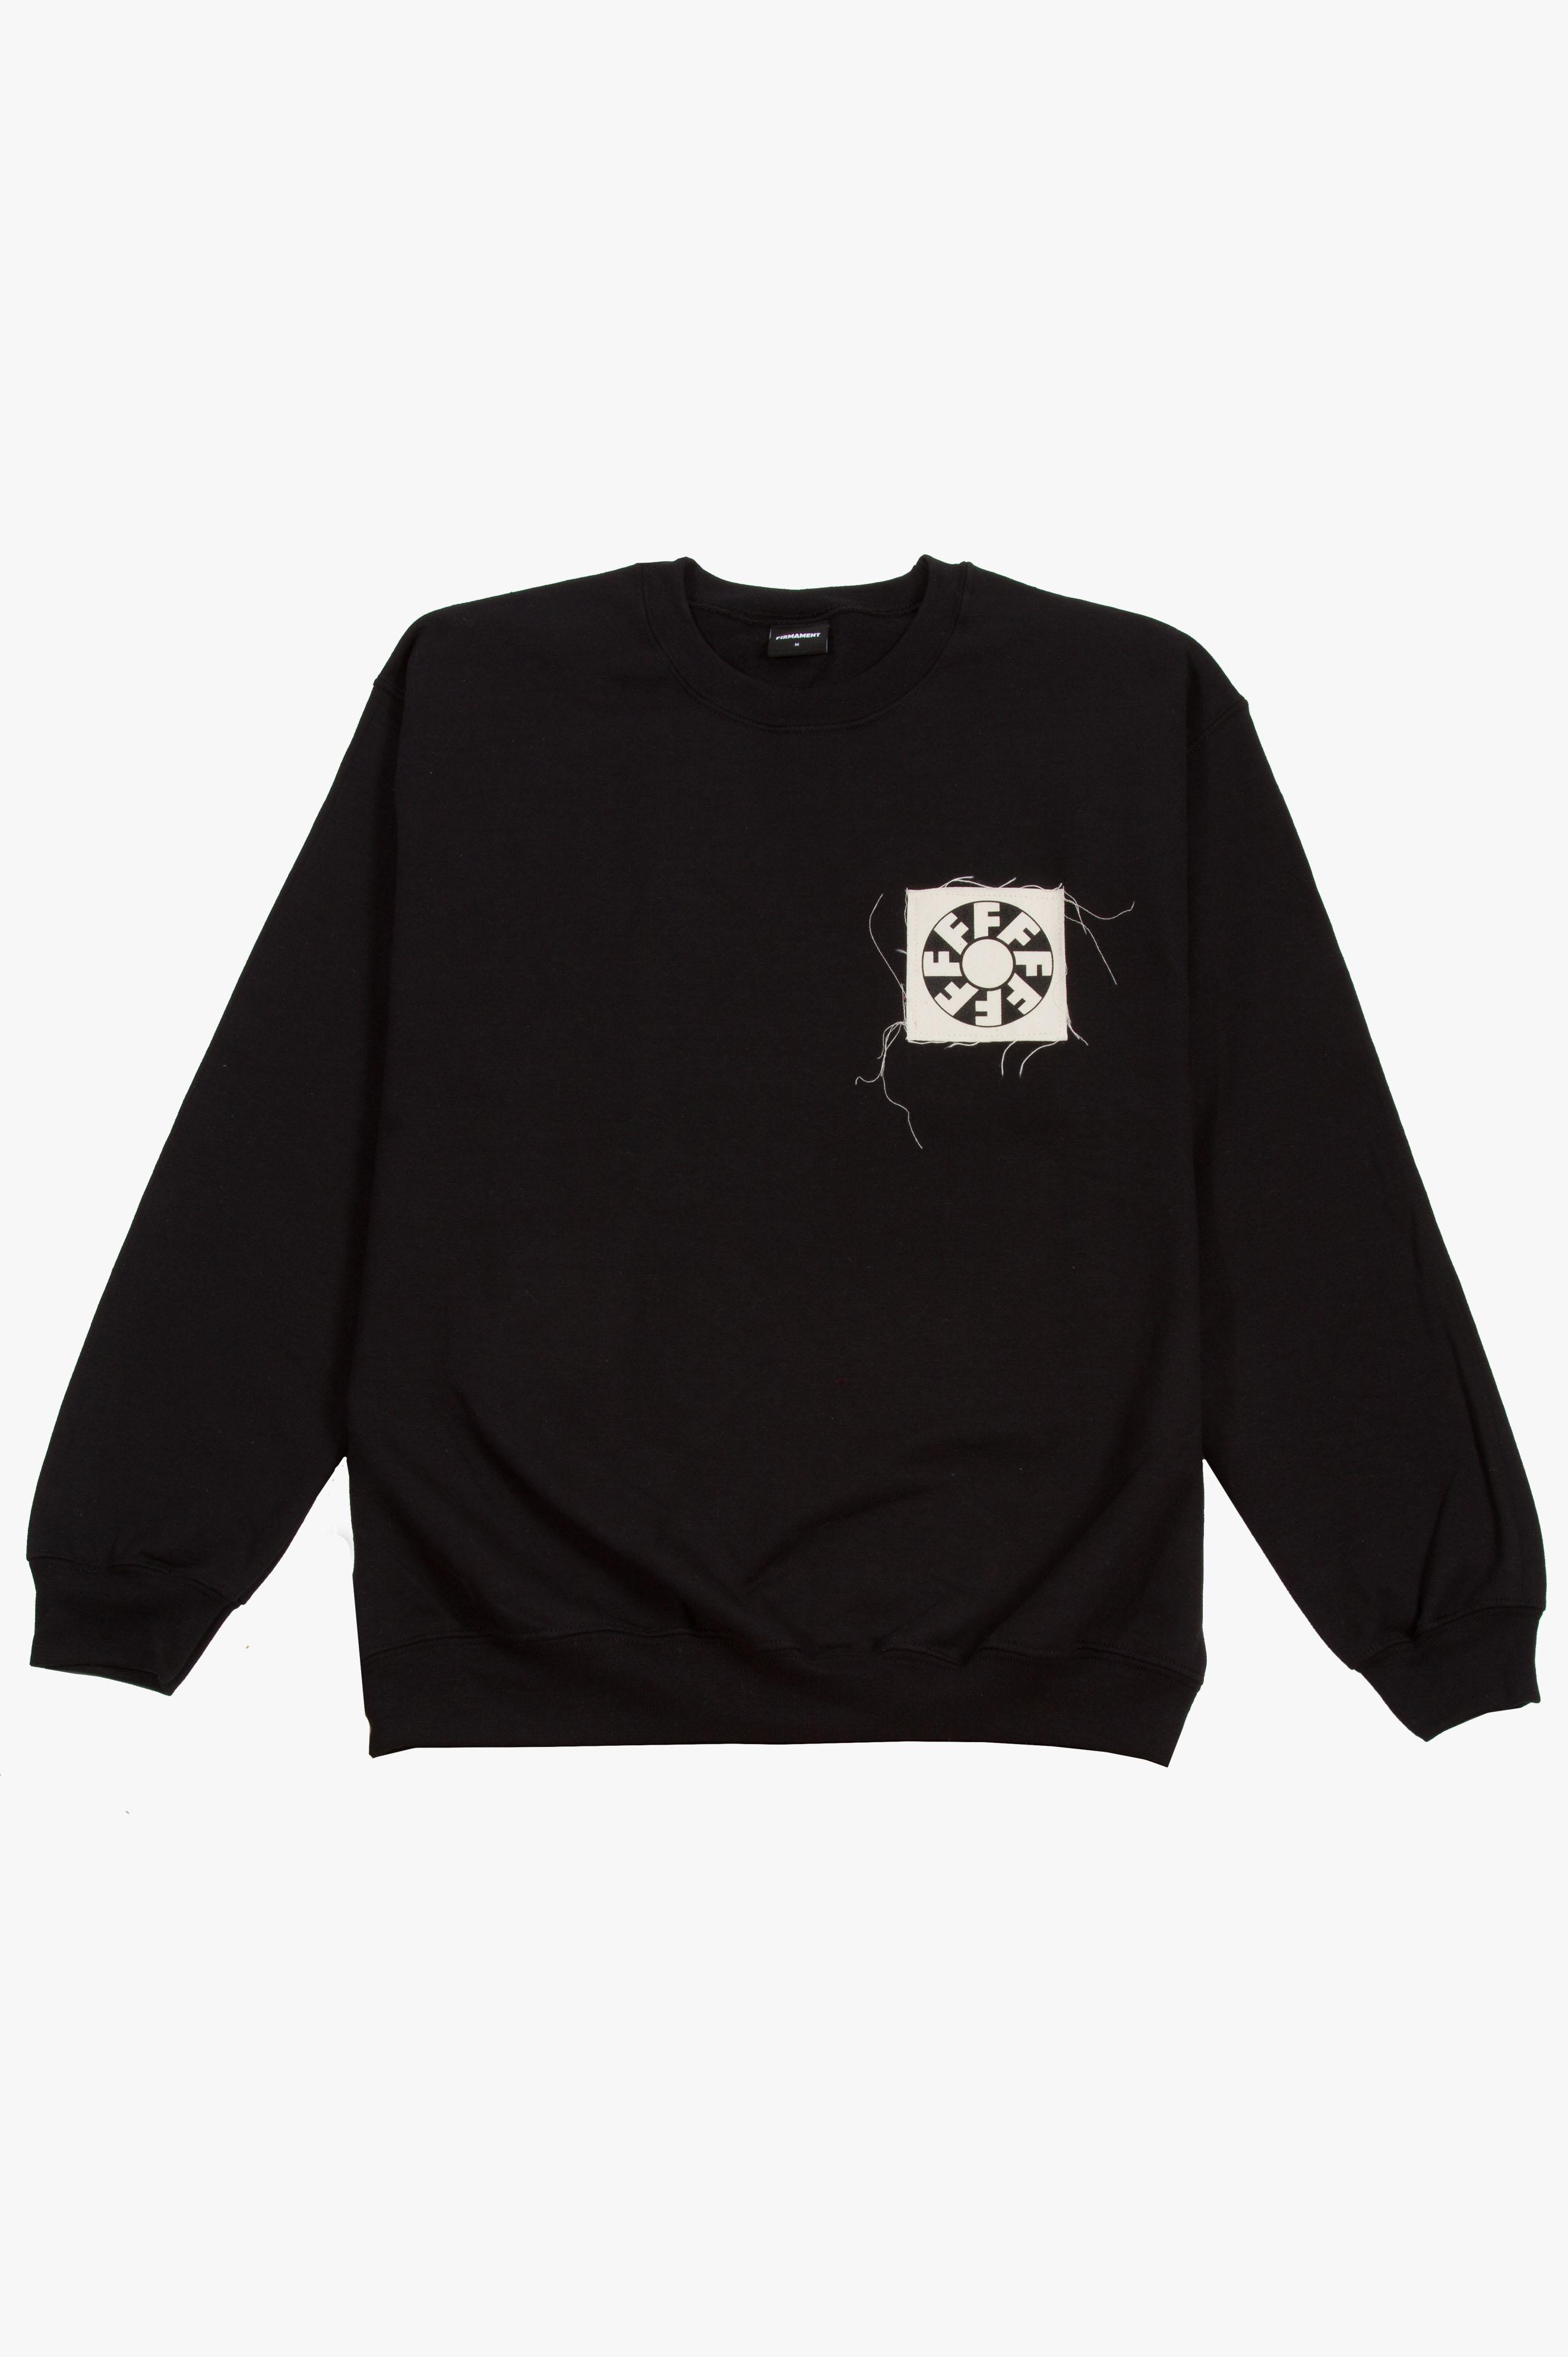 ITI Patch Sweatshirt Black